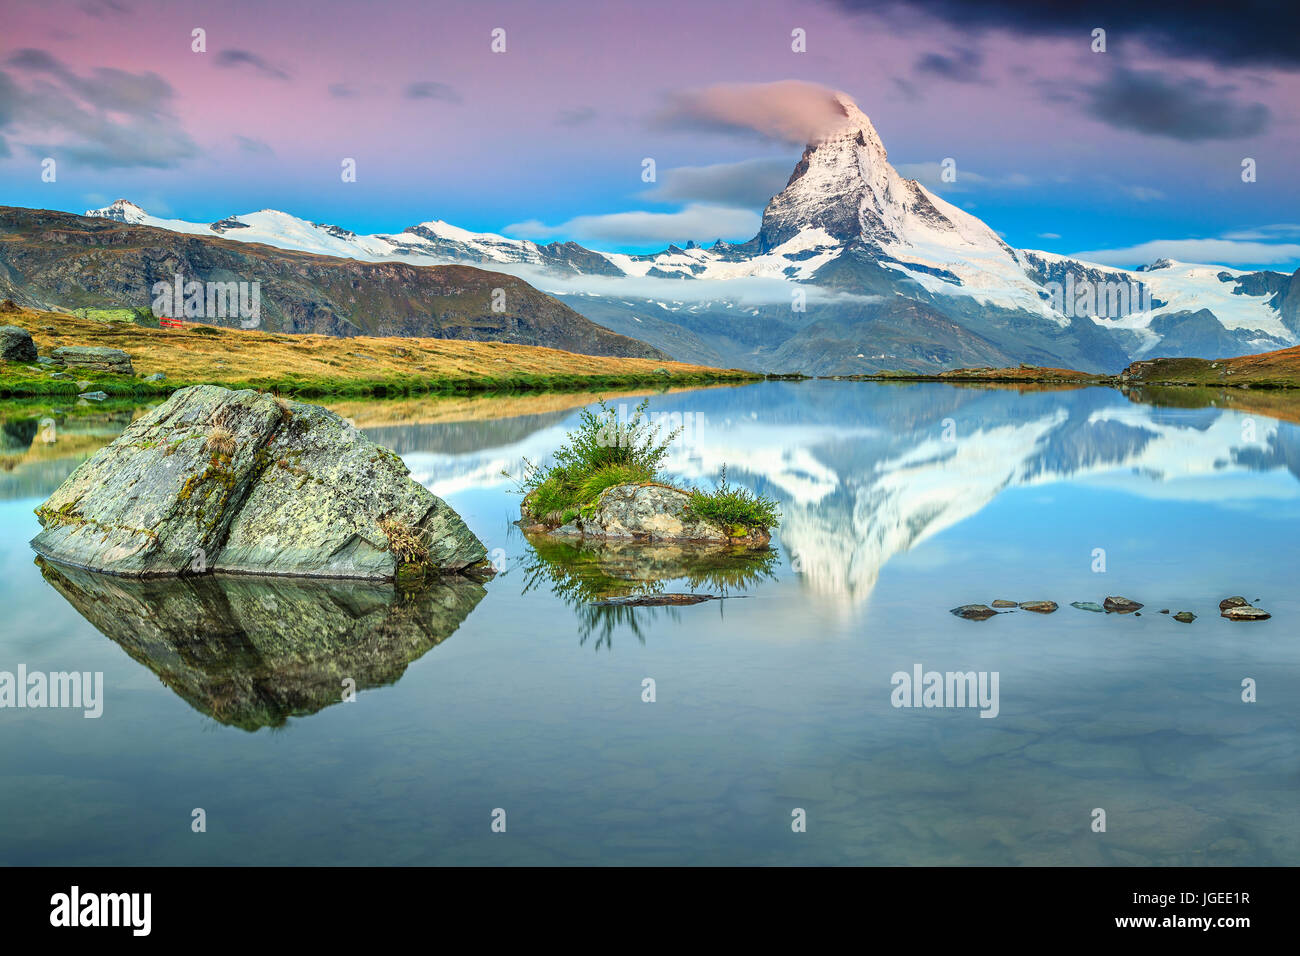 Fantastic sunrise panorama with Matterhorn and beautiful famous alpine lake, Stellisee, Valais region, Switzerland, - Stock Image